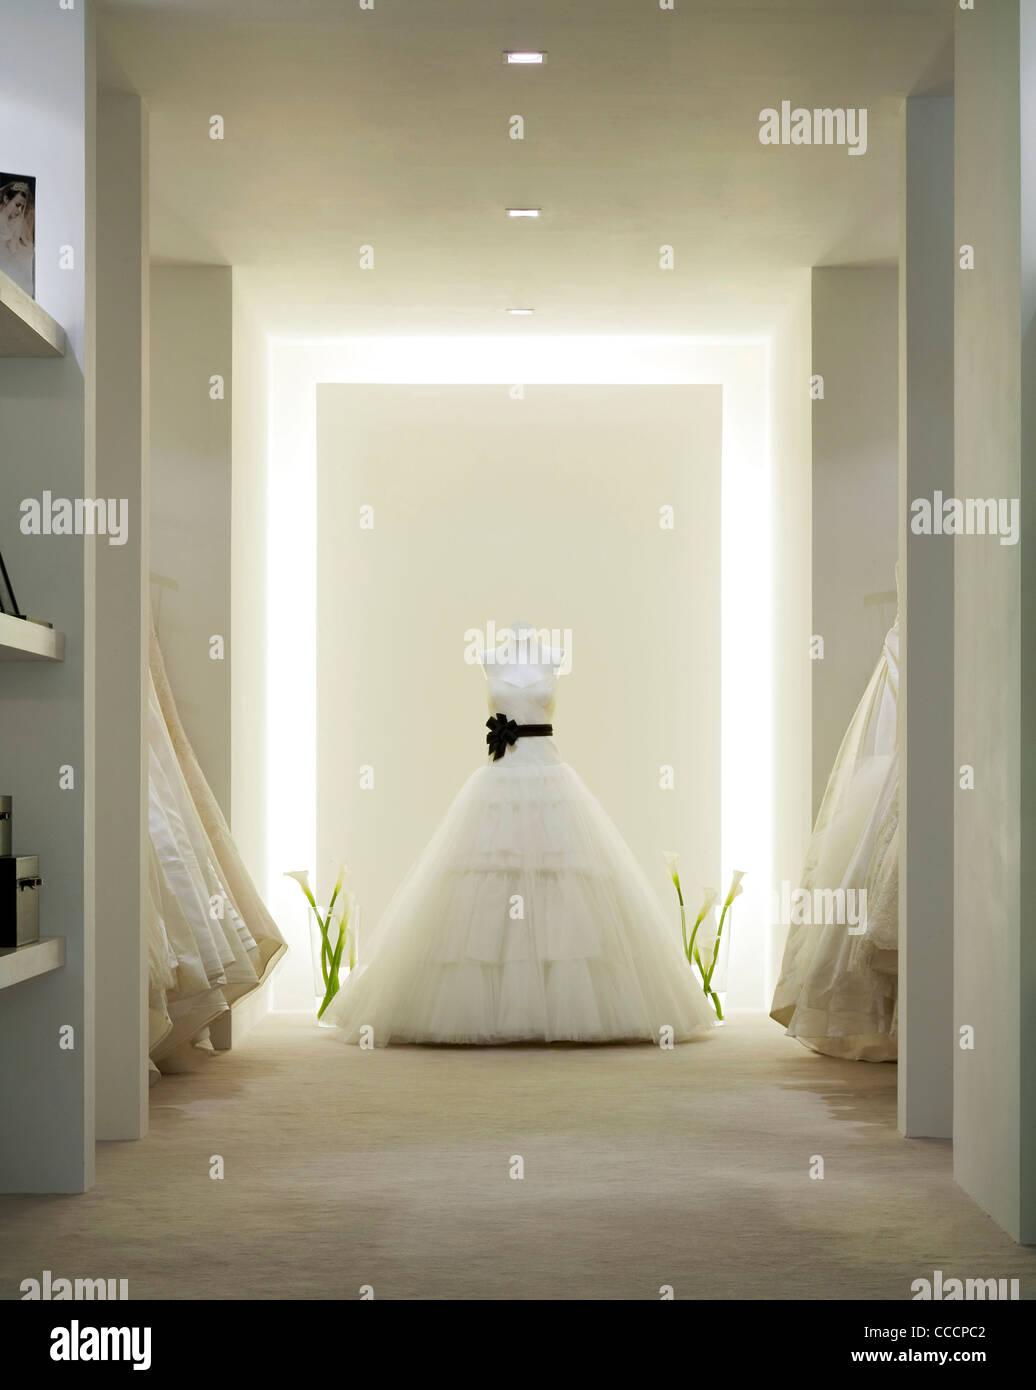 VERA WANG WEDDING SHOP SHOP interno Immagini Stock